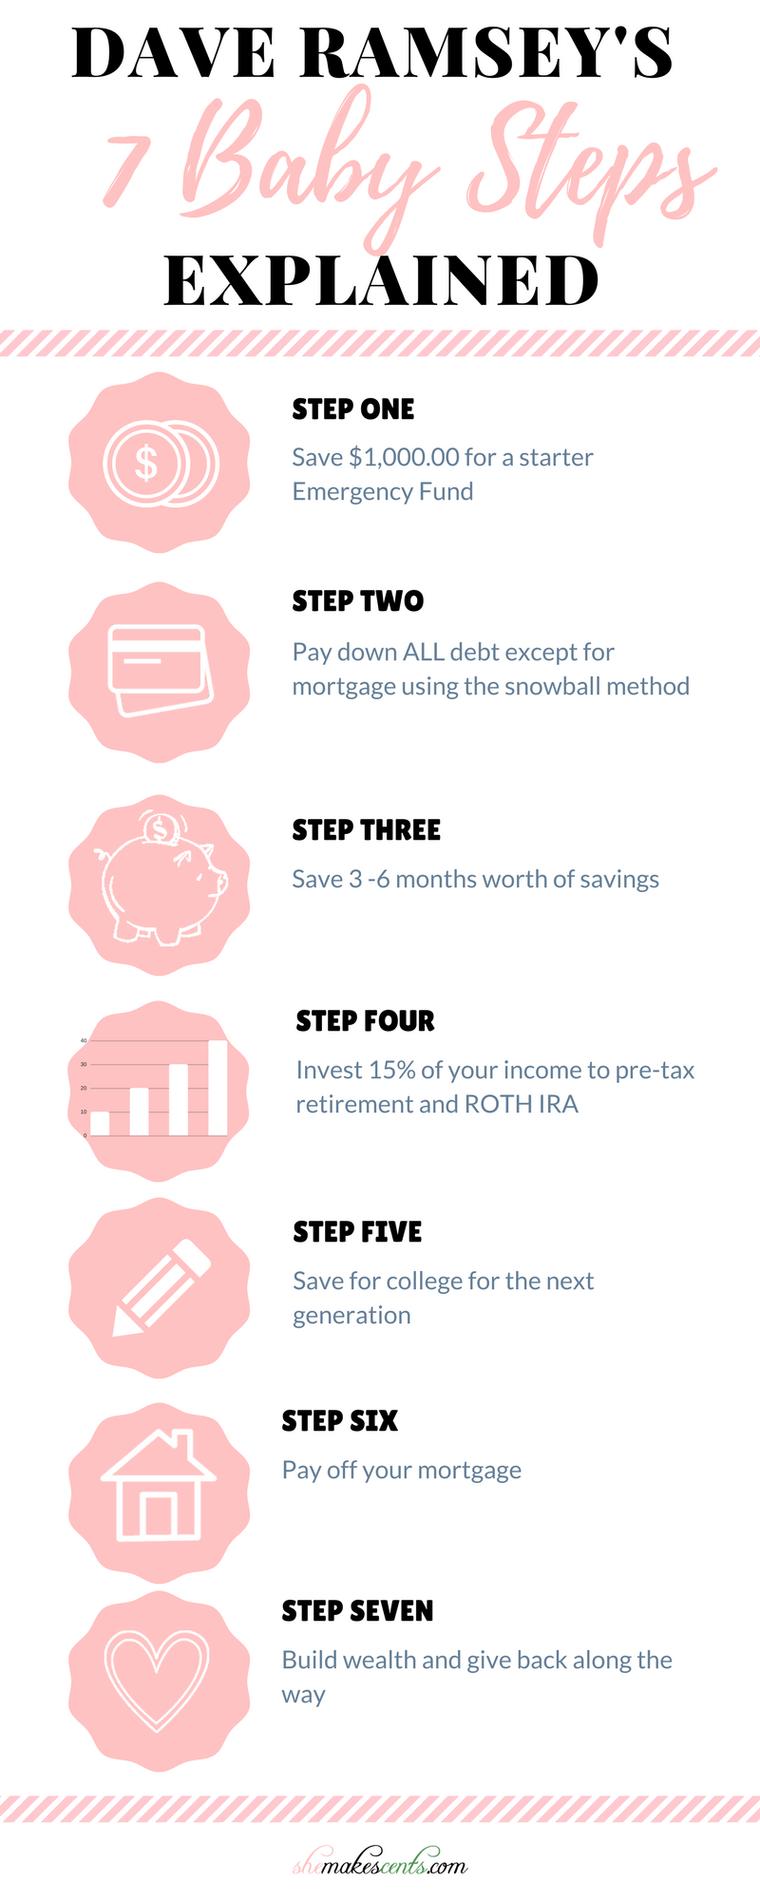 Dave Ramseys 7 Baby Steps Explained Money Matters Pinterest